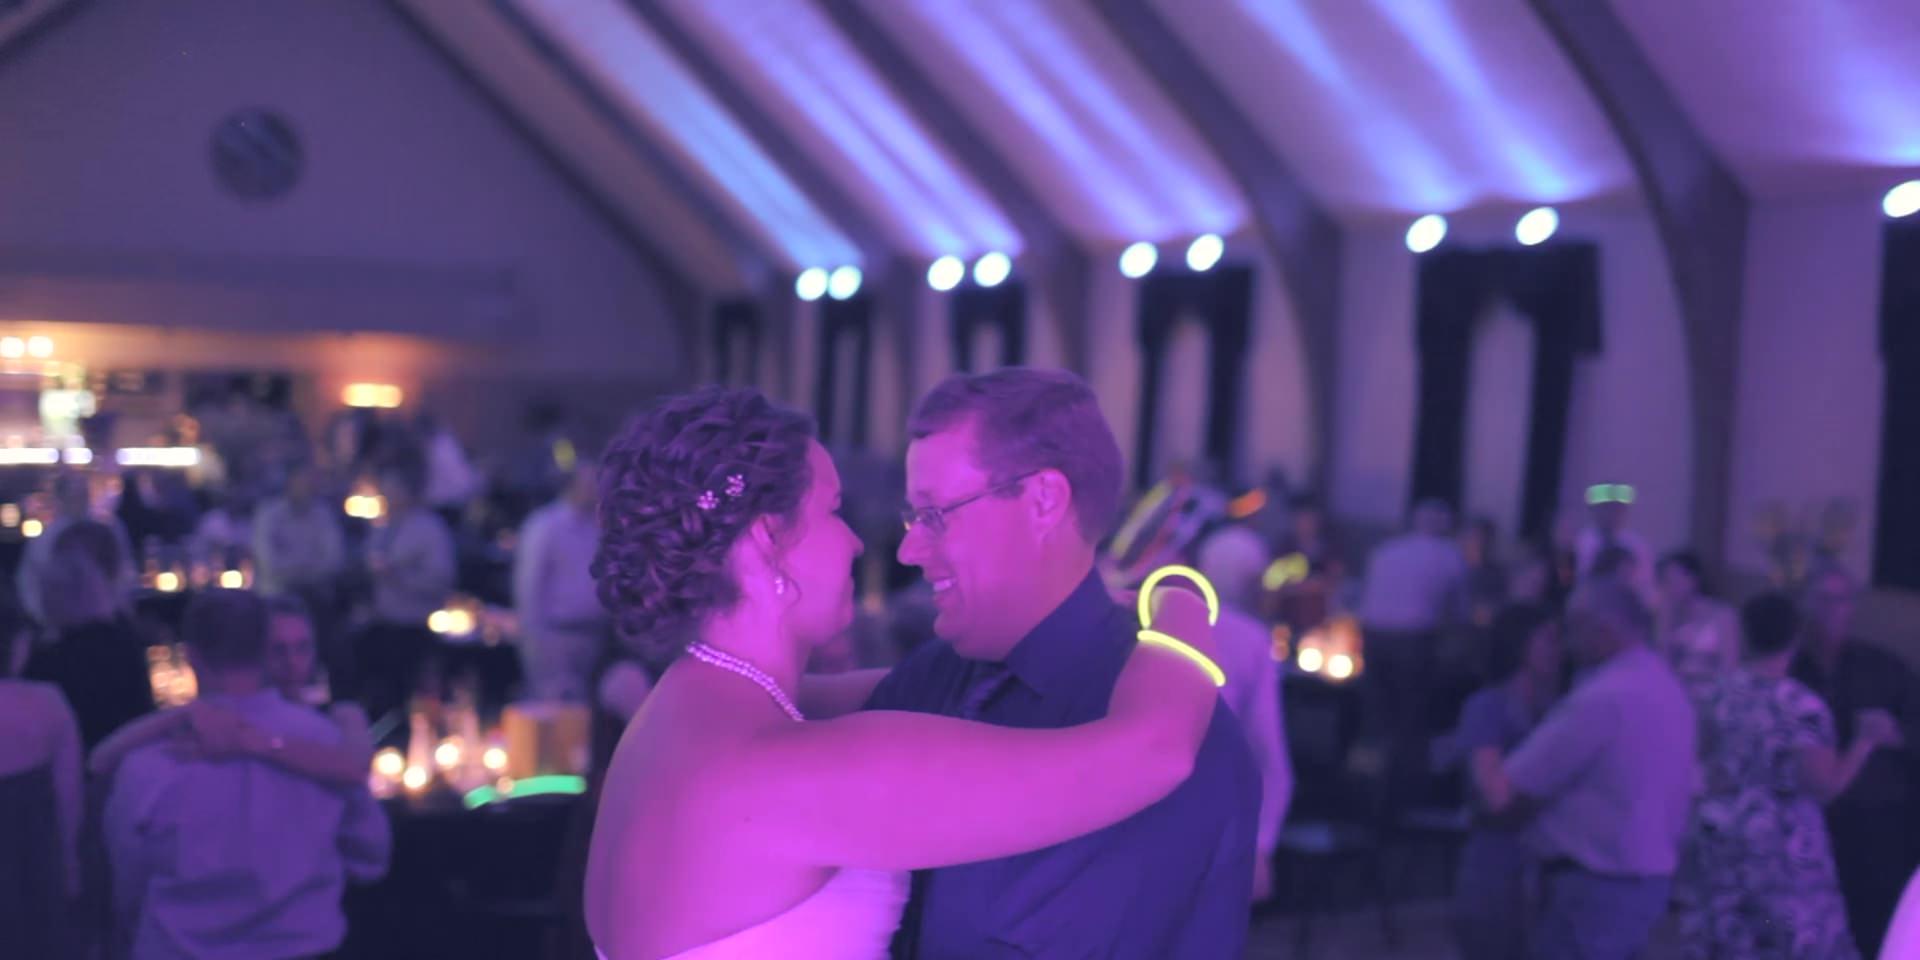 eric&lindsey wedding story.mp4-still00016.jpg